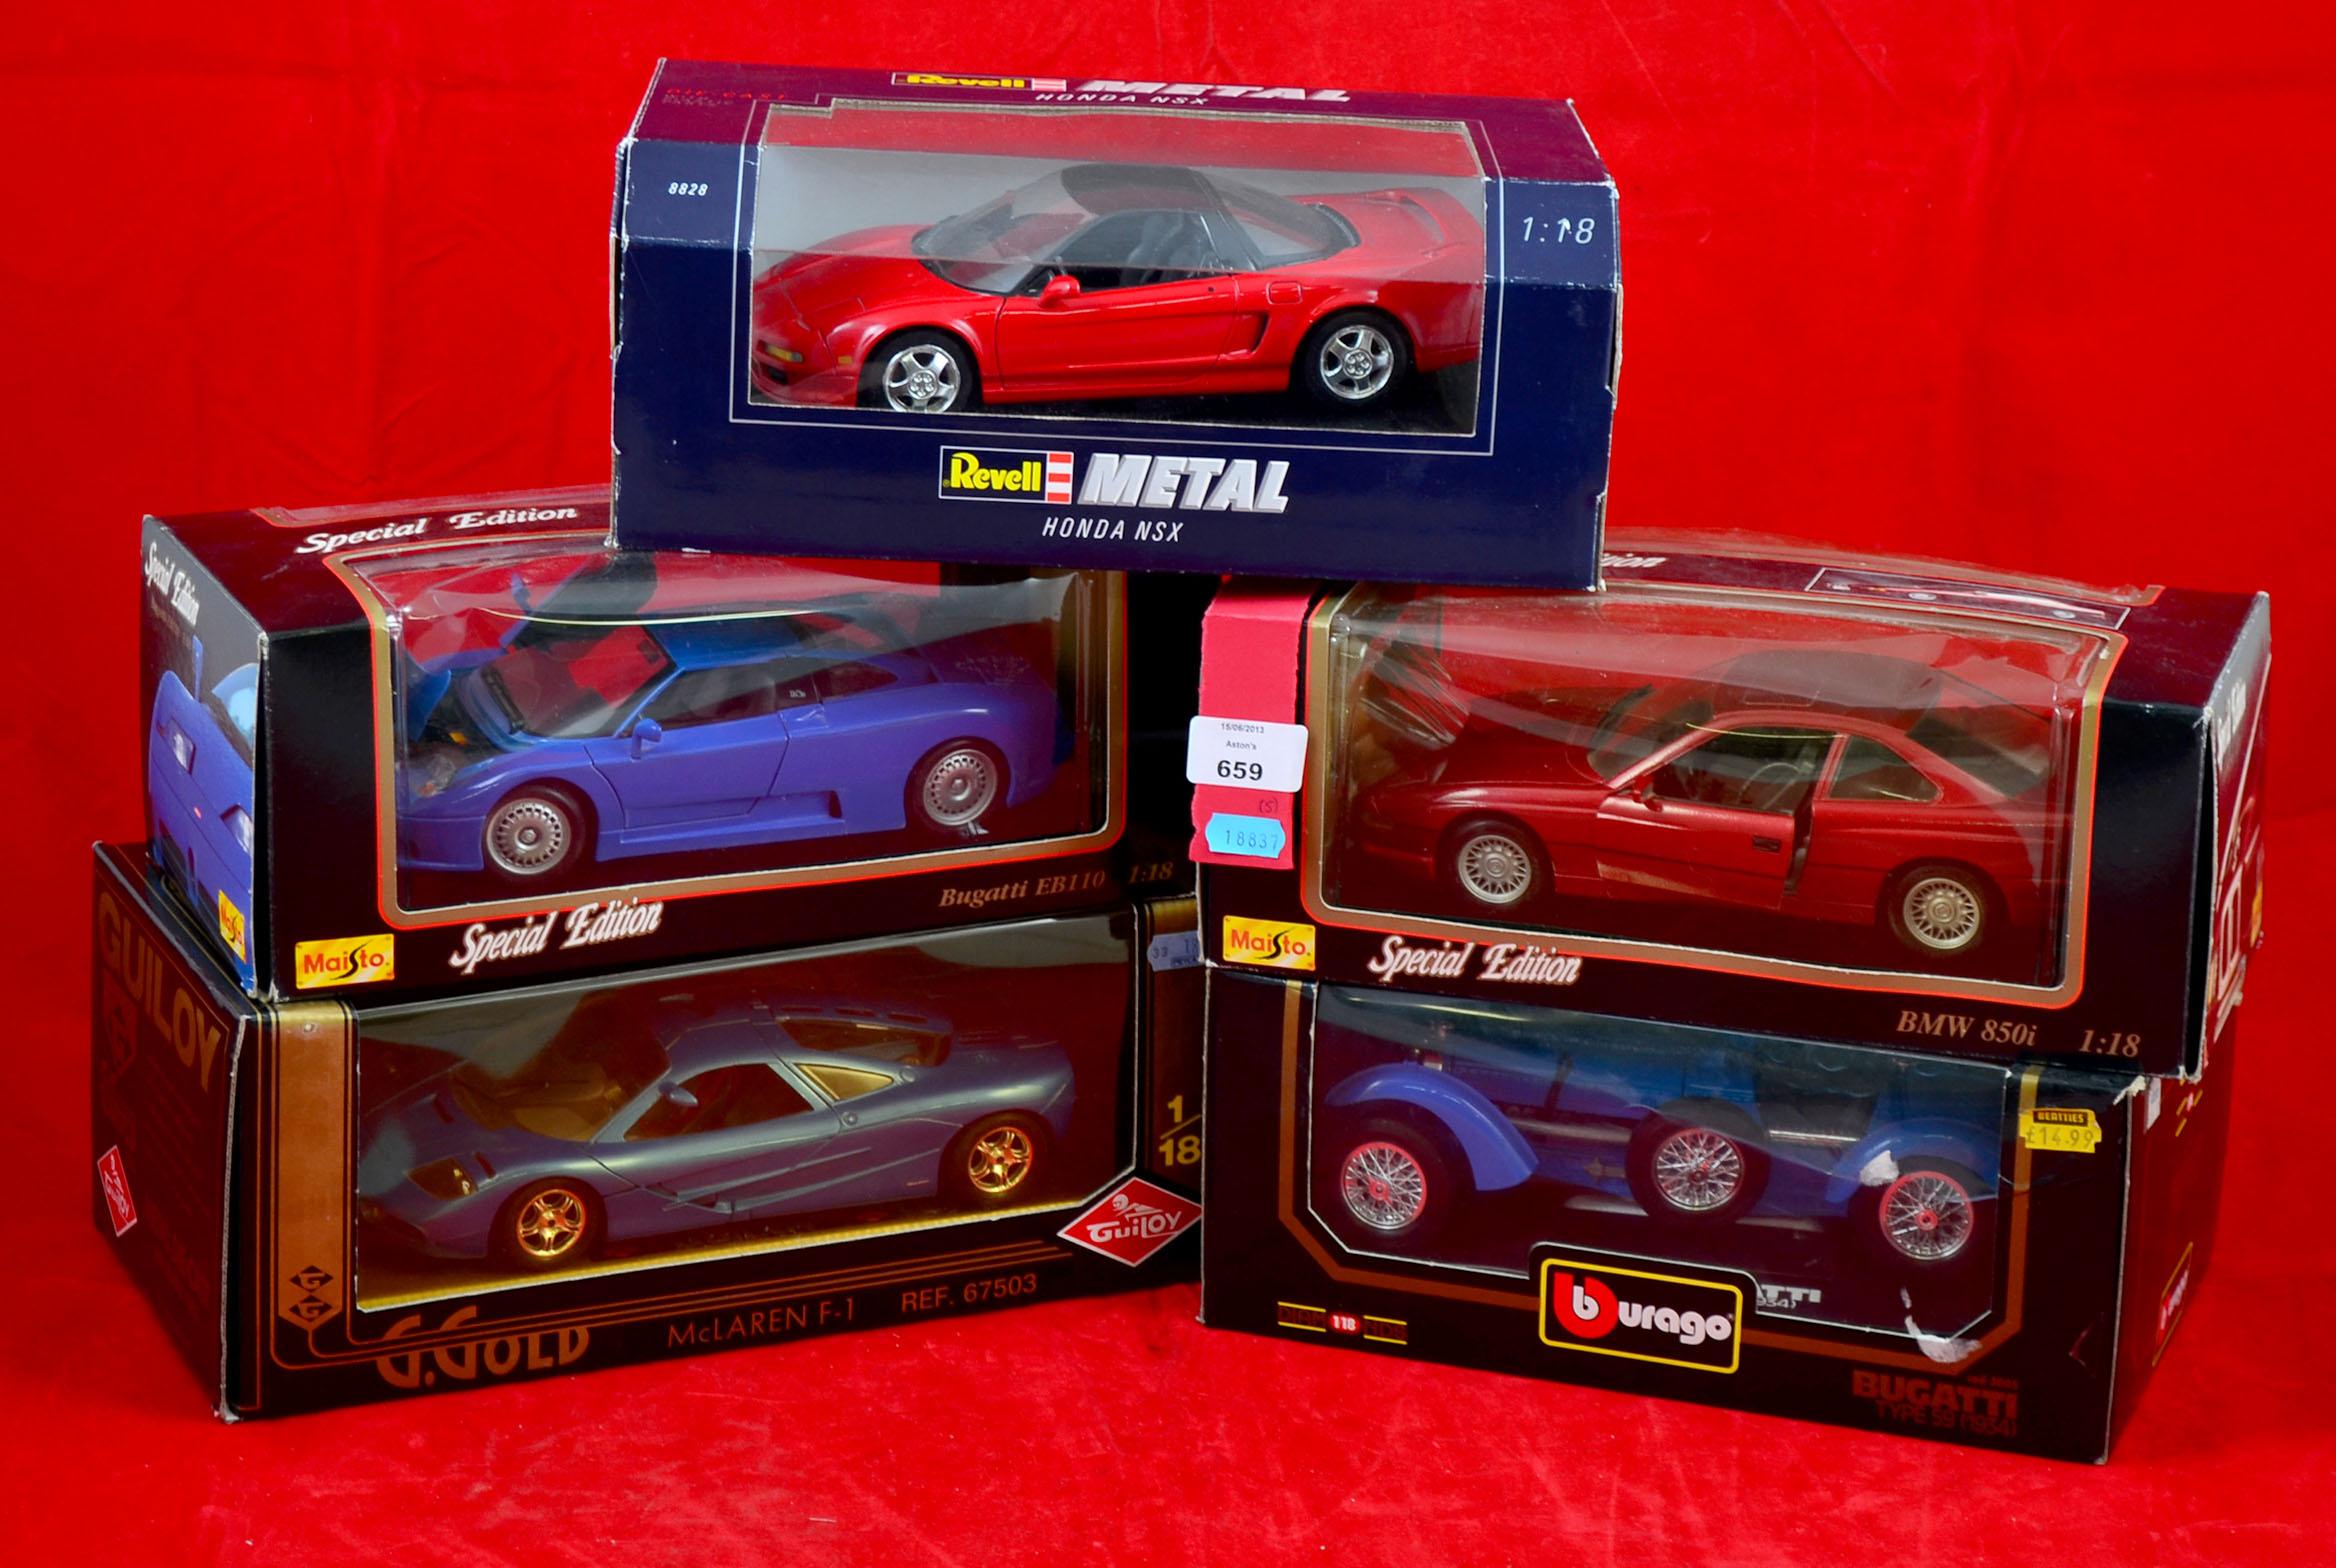 Five 1 18 Scale Die Cast Model Cars Revell 8828 Honda Nsx Maisto